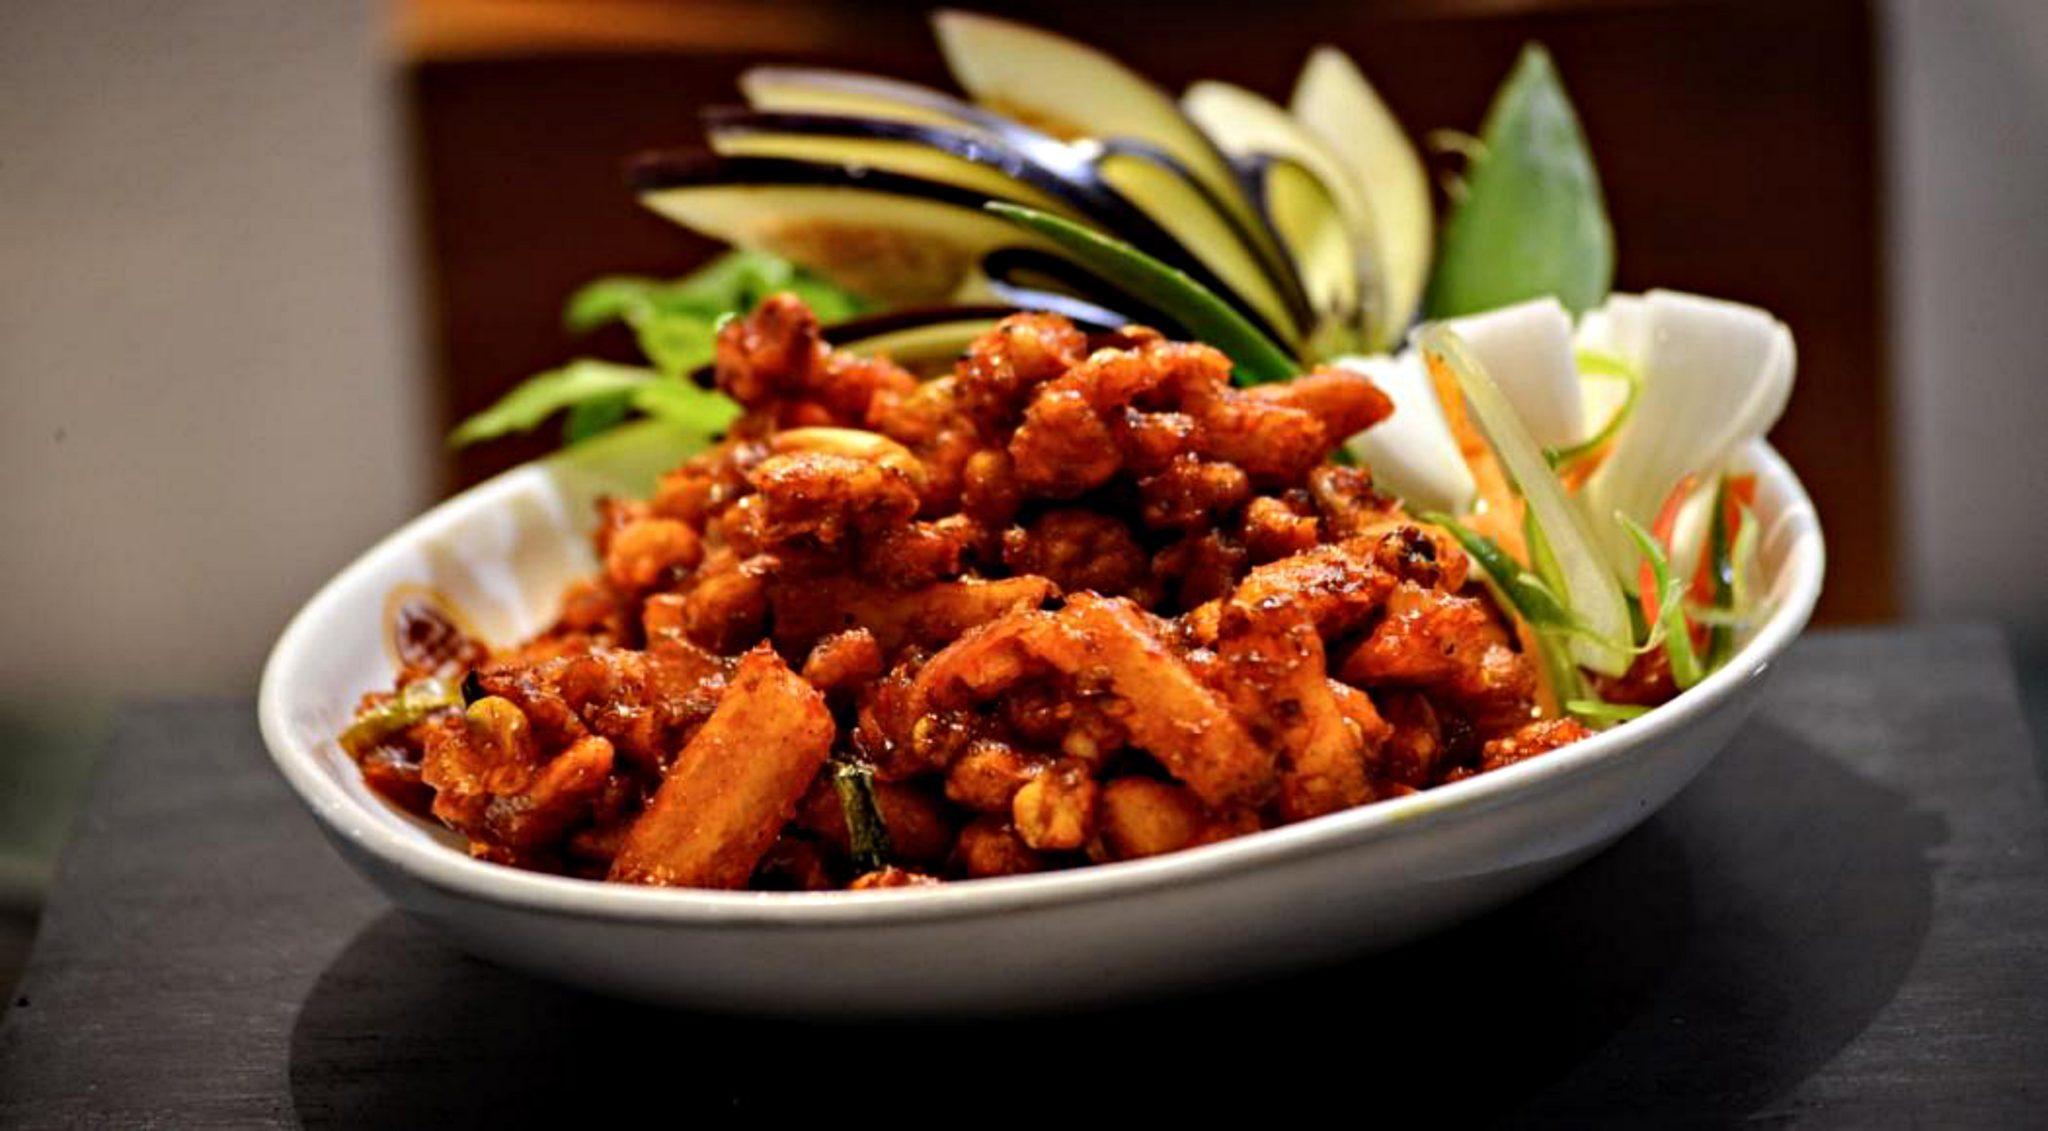 Tsinghoi style Potato & Golden corn